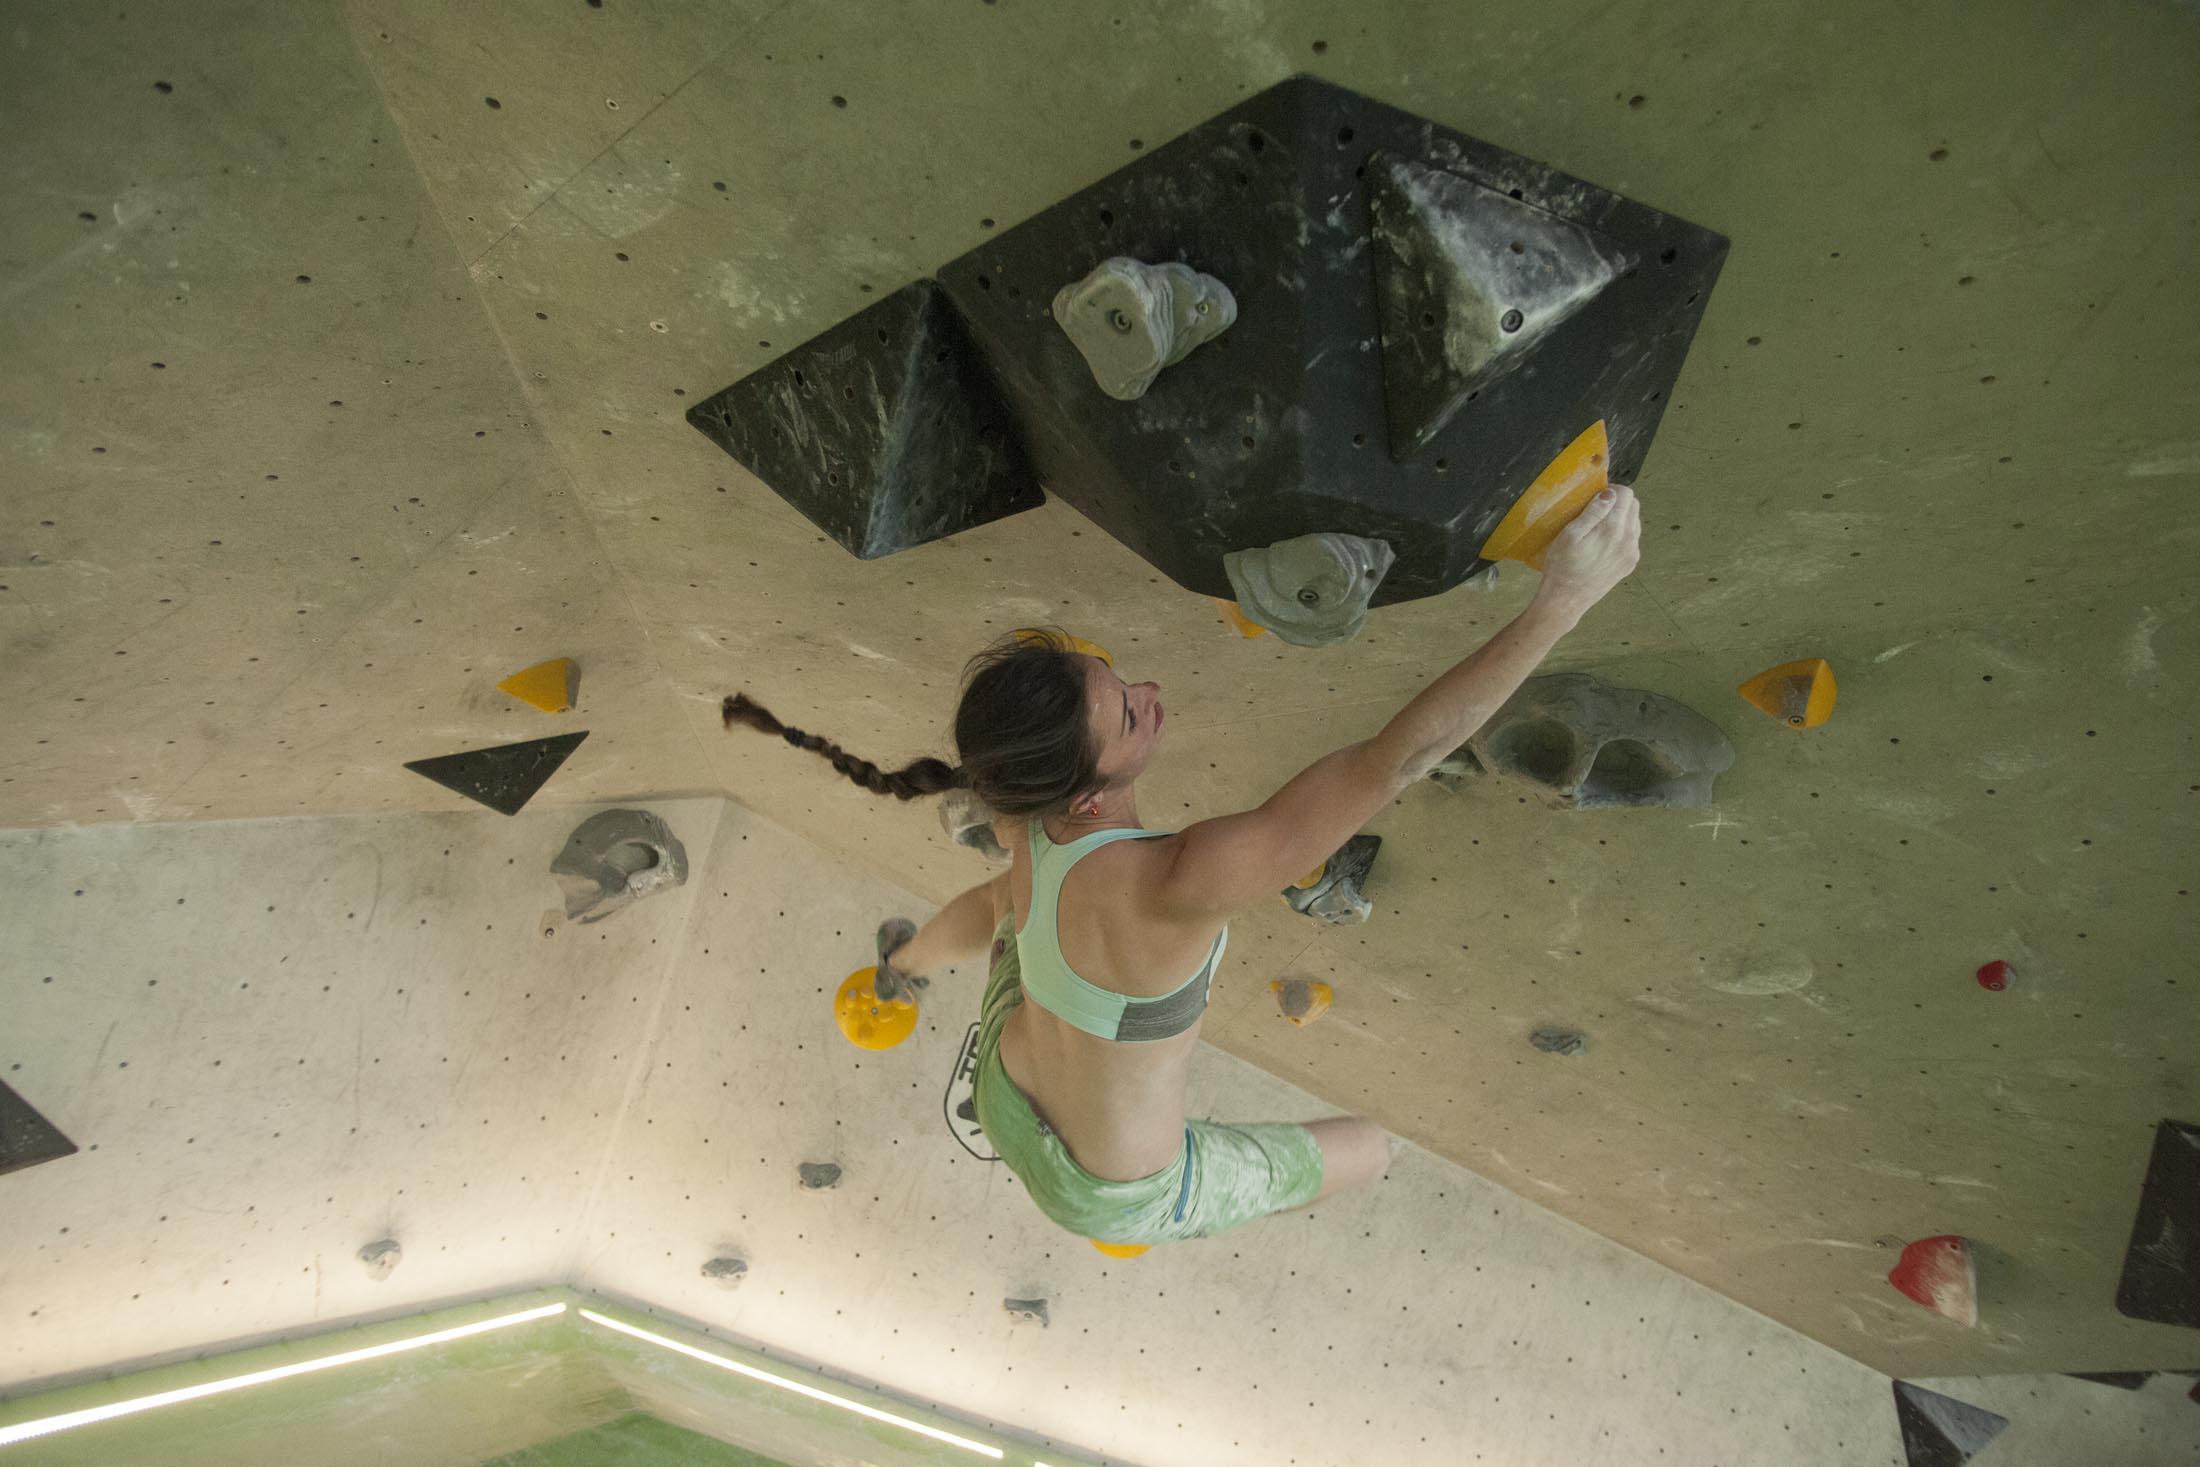 Quali, internationaler bouldercup Frankenjura 2016, BLOCKHELDEN Erlangen, Mammut, Bergfreunde.de, Boulderwettkampf07092016374